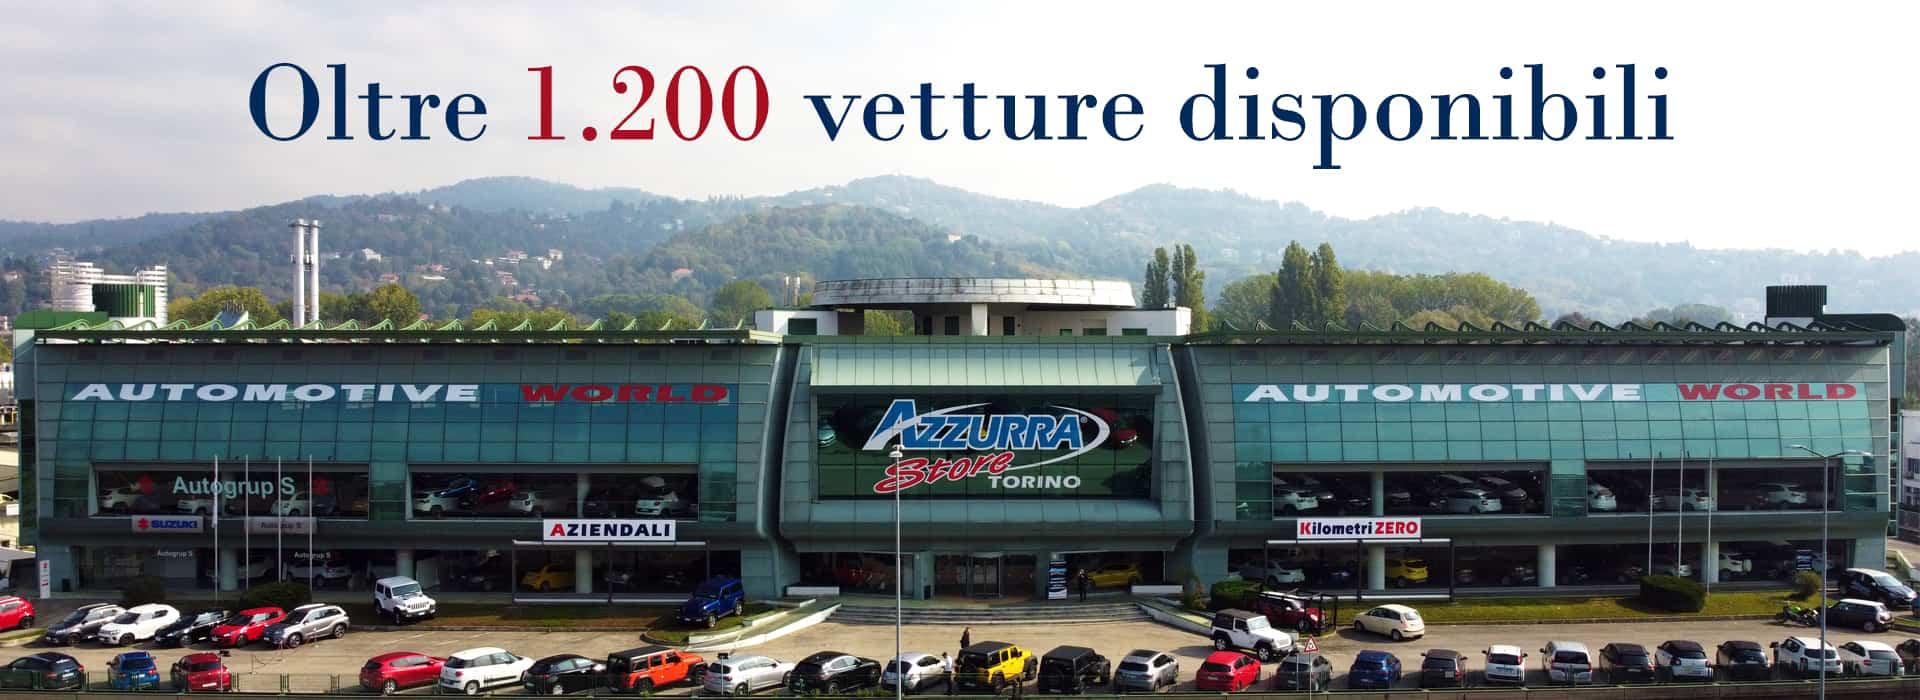 1200 vetture disponibili